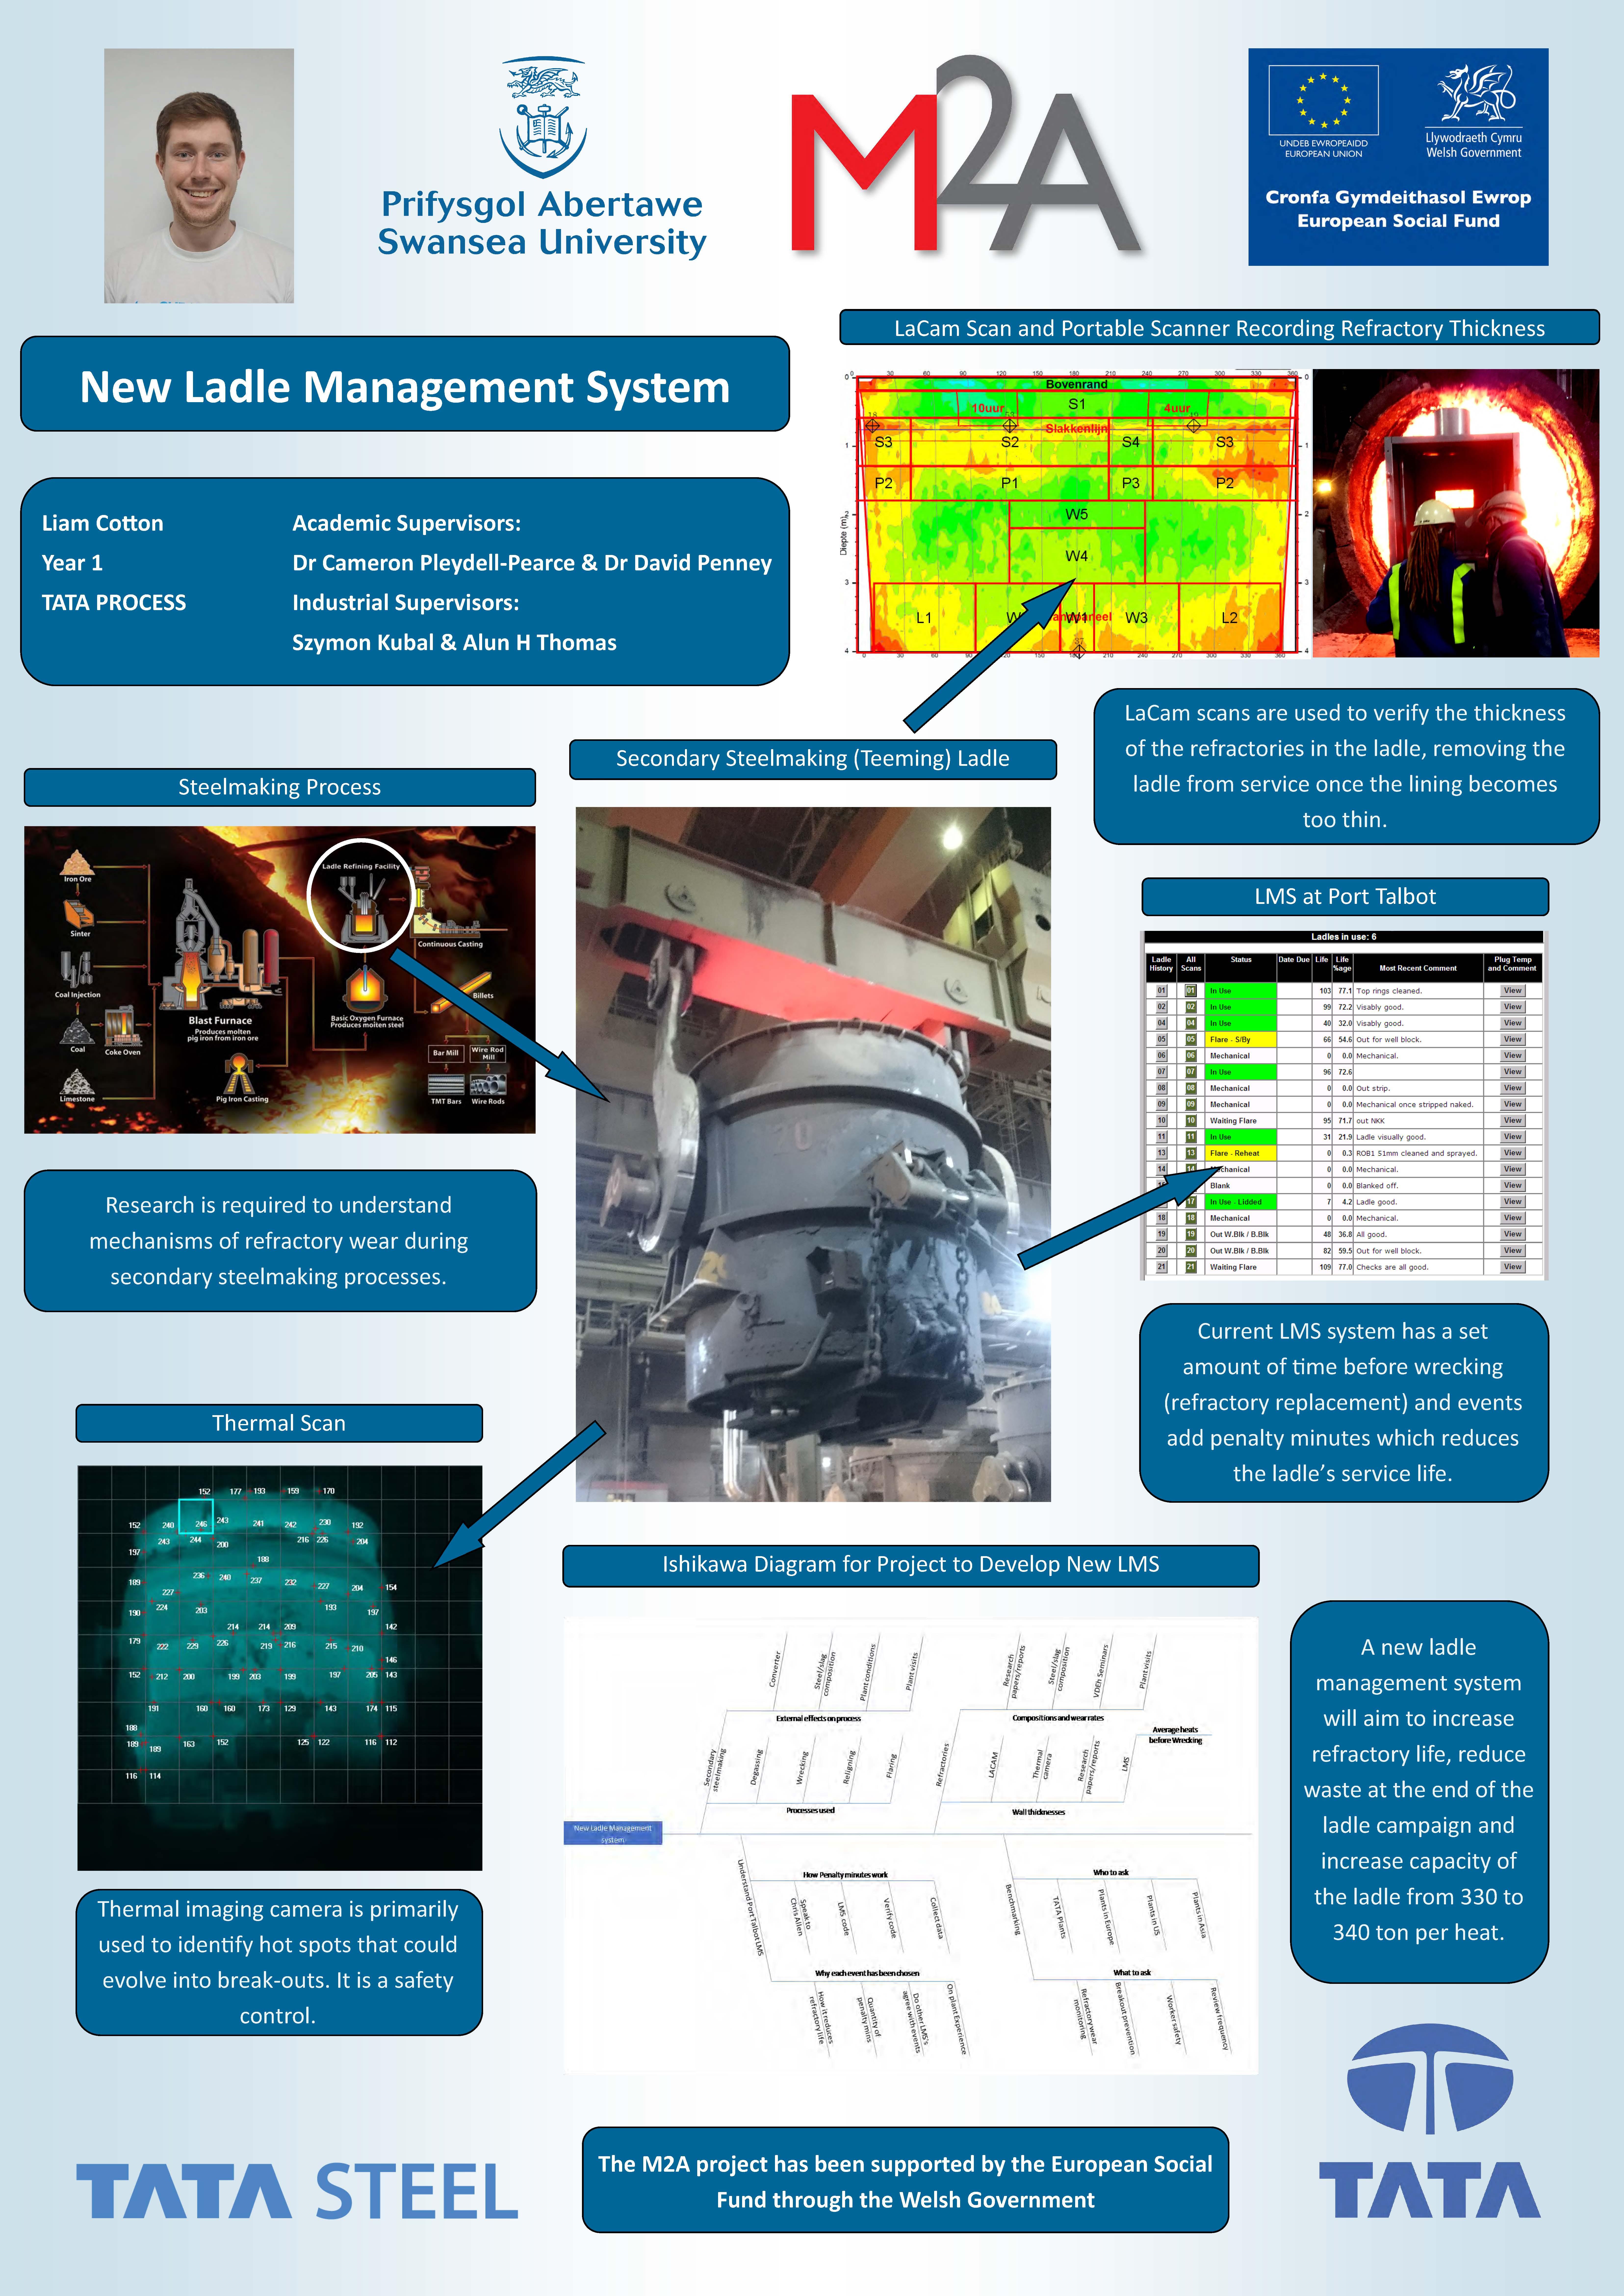 New Ladle Management System